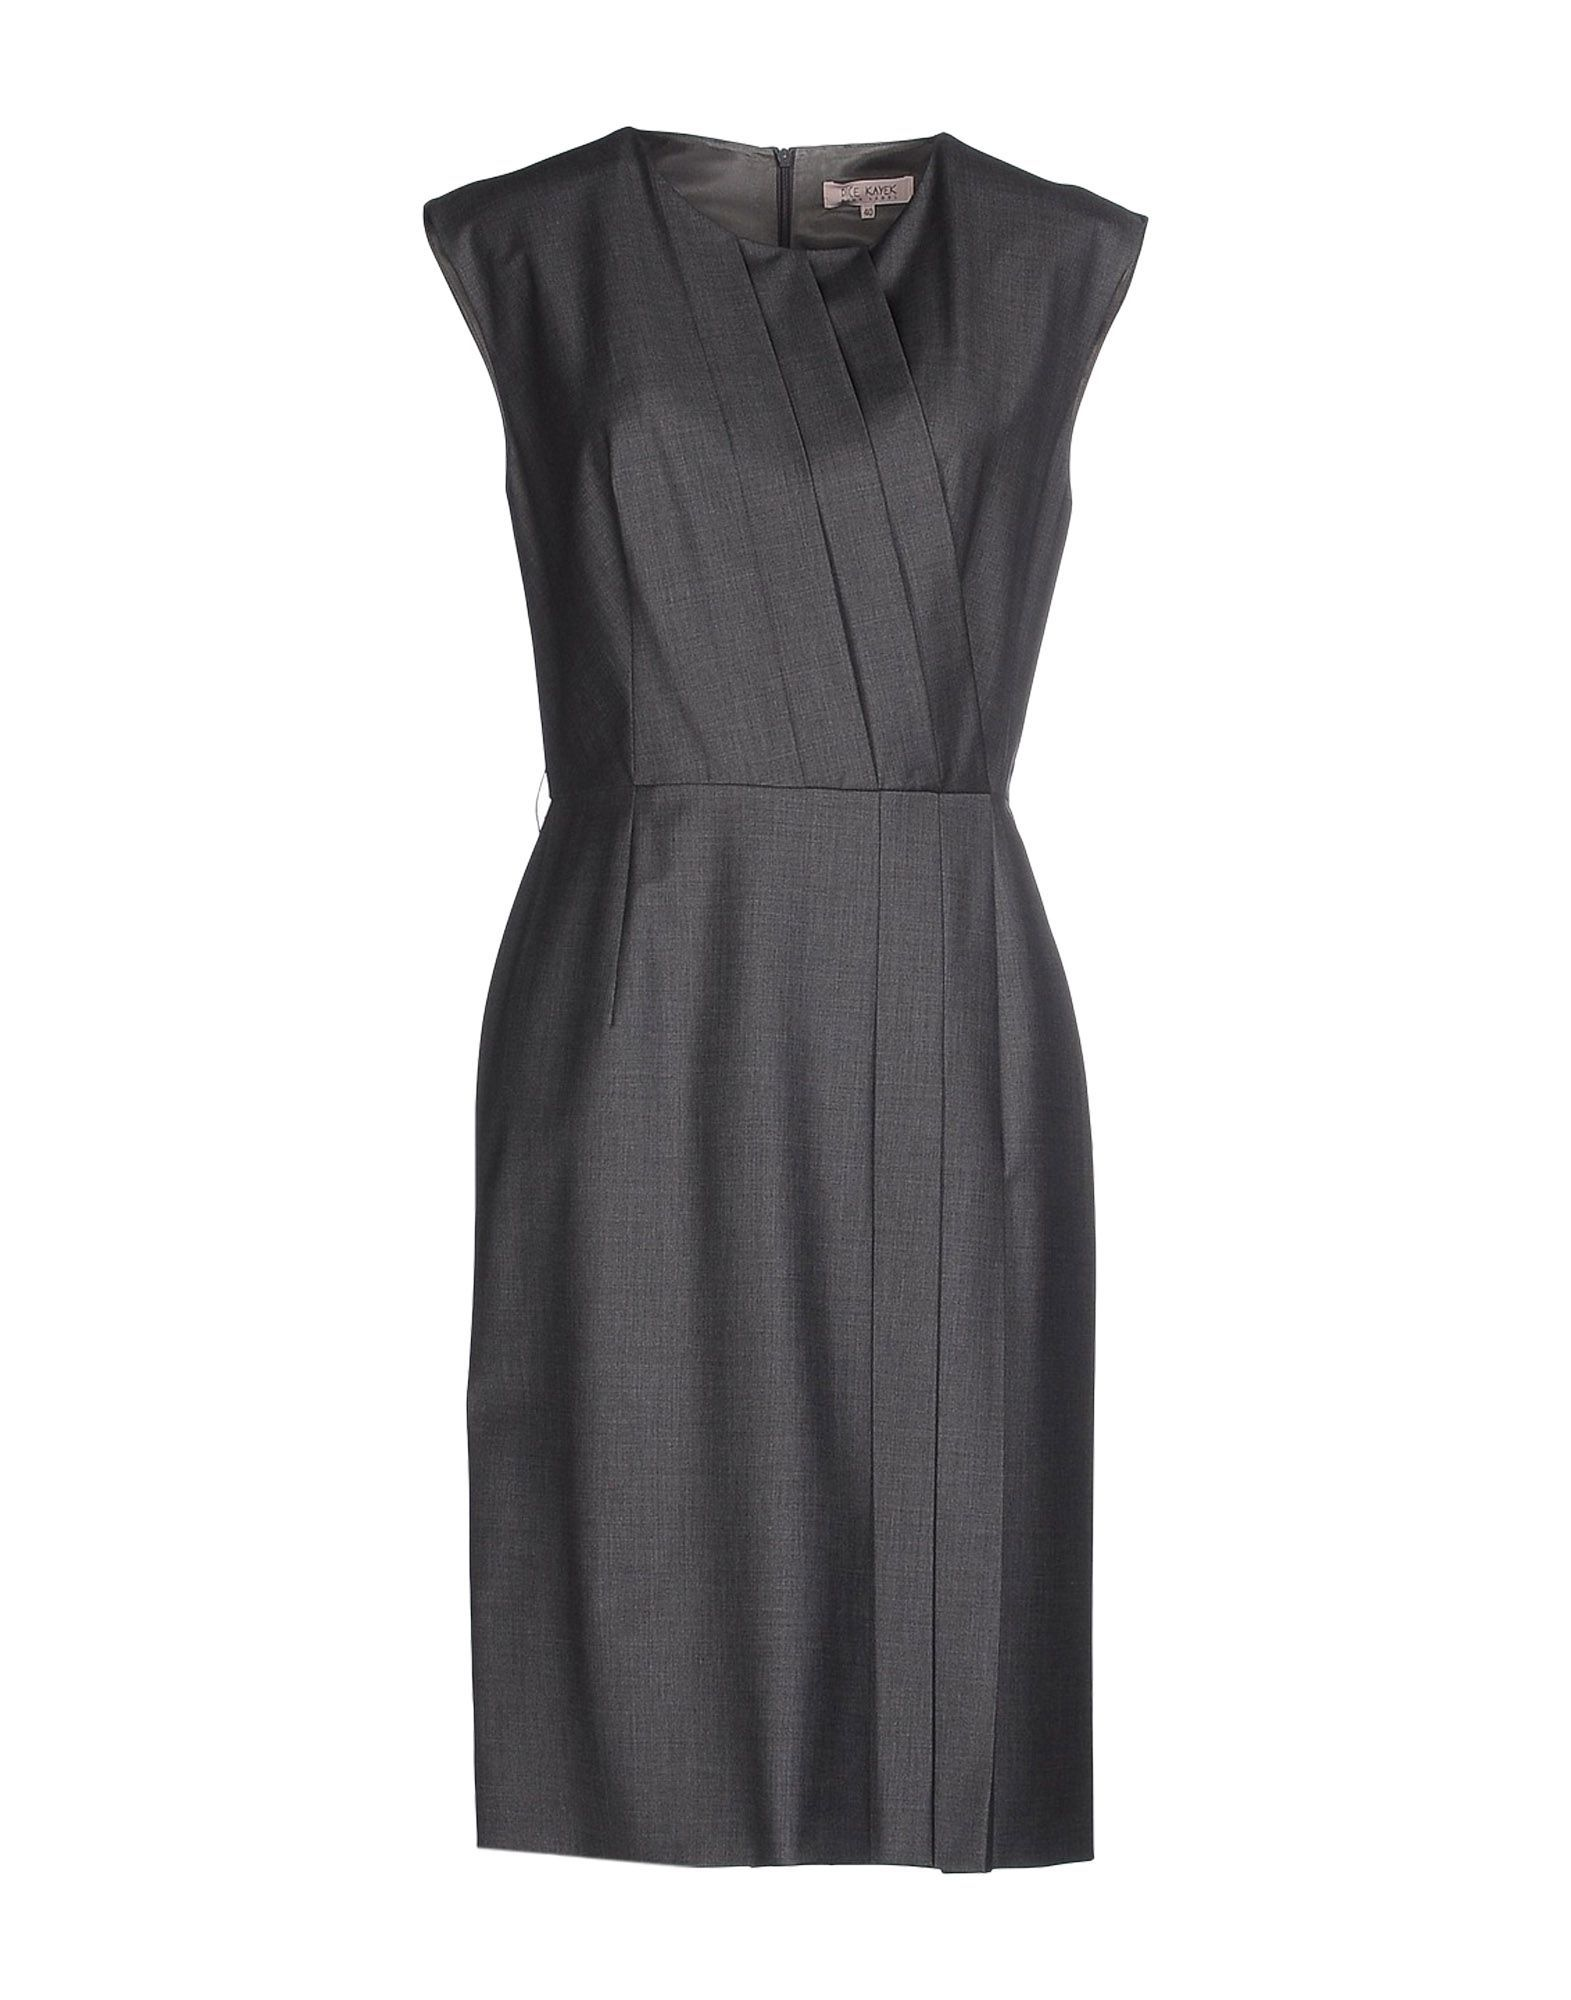 DICE KAYEK Knee-length dress